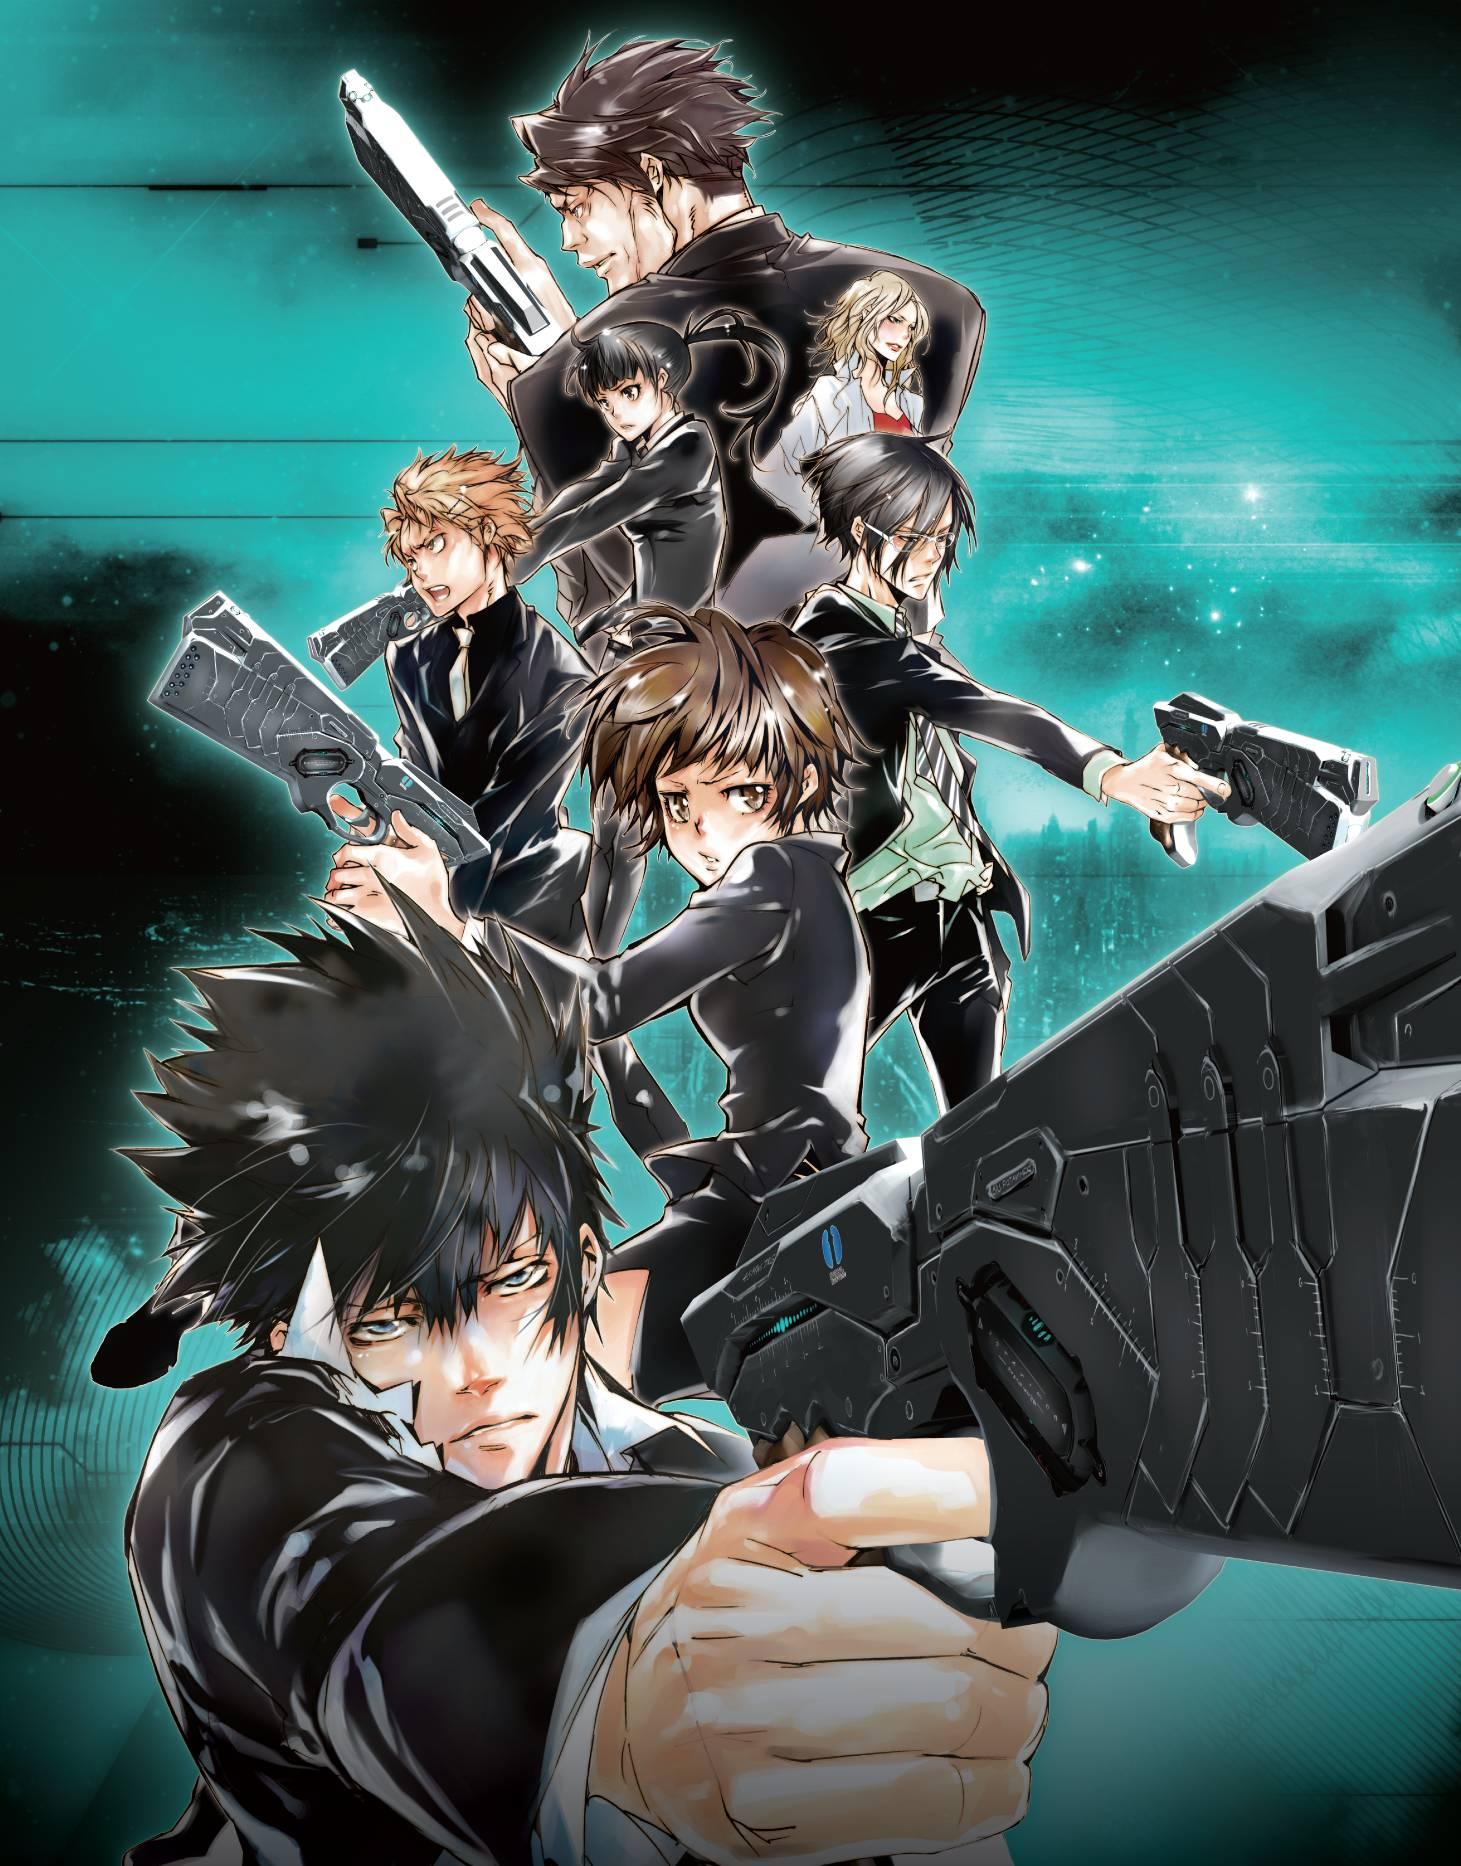 Psycho Pass Psycho-pass-anime